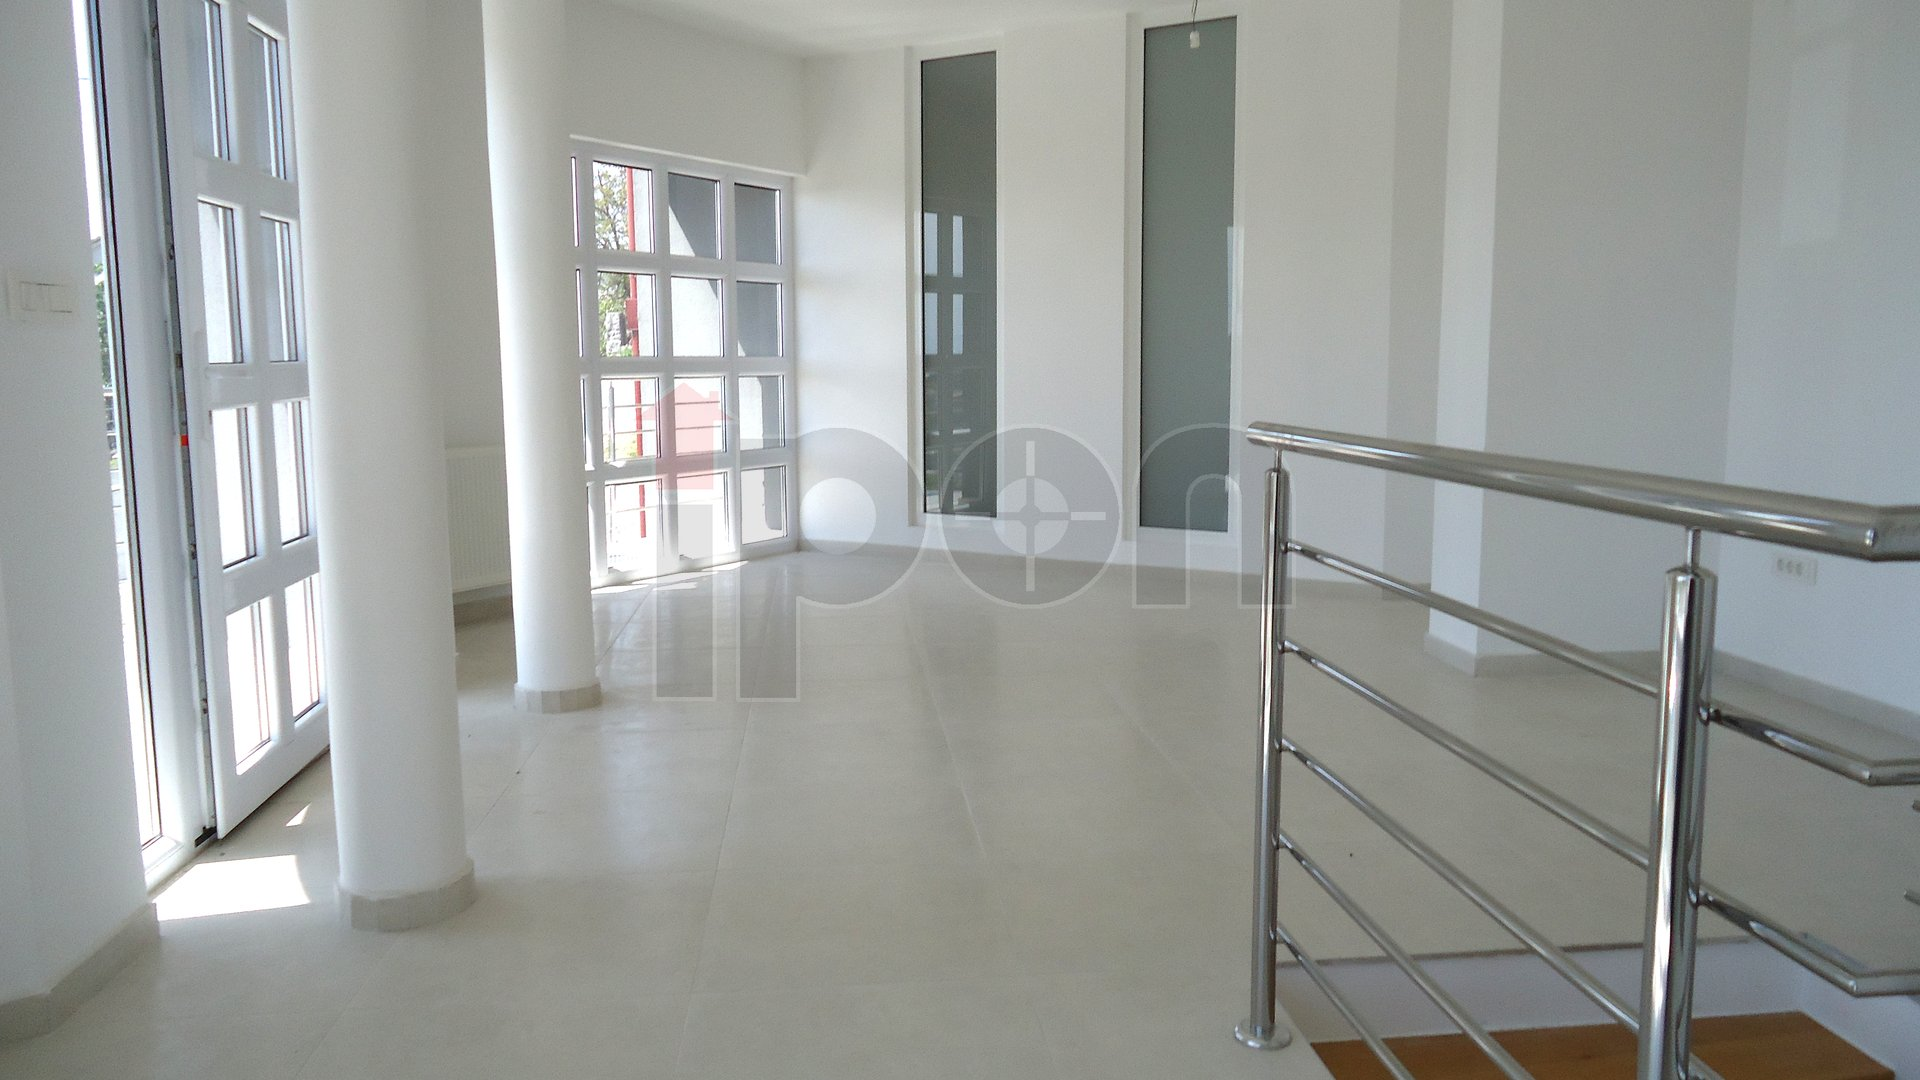 Commercial Property, 113 m2, For Sale, Kastav - Rešetari